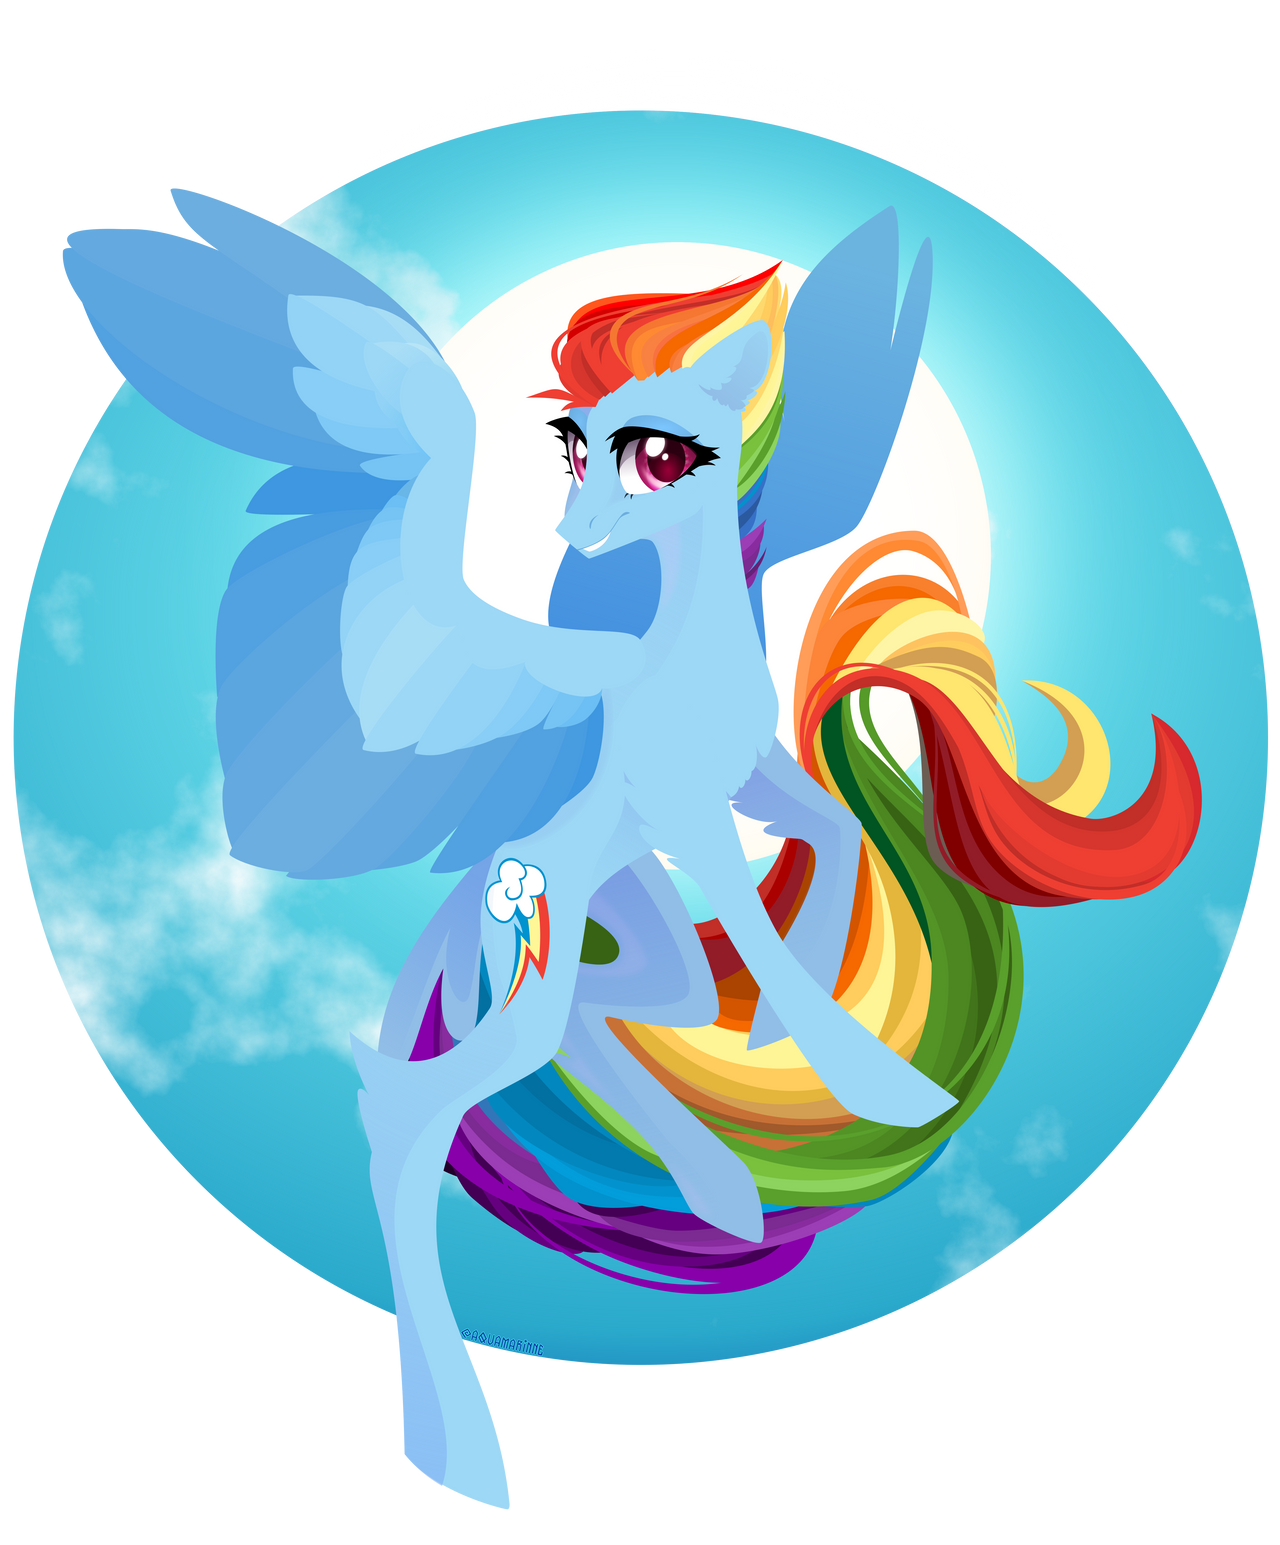 Rainbow Dash by GLaSTALINKA